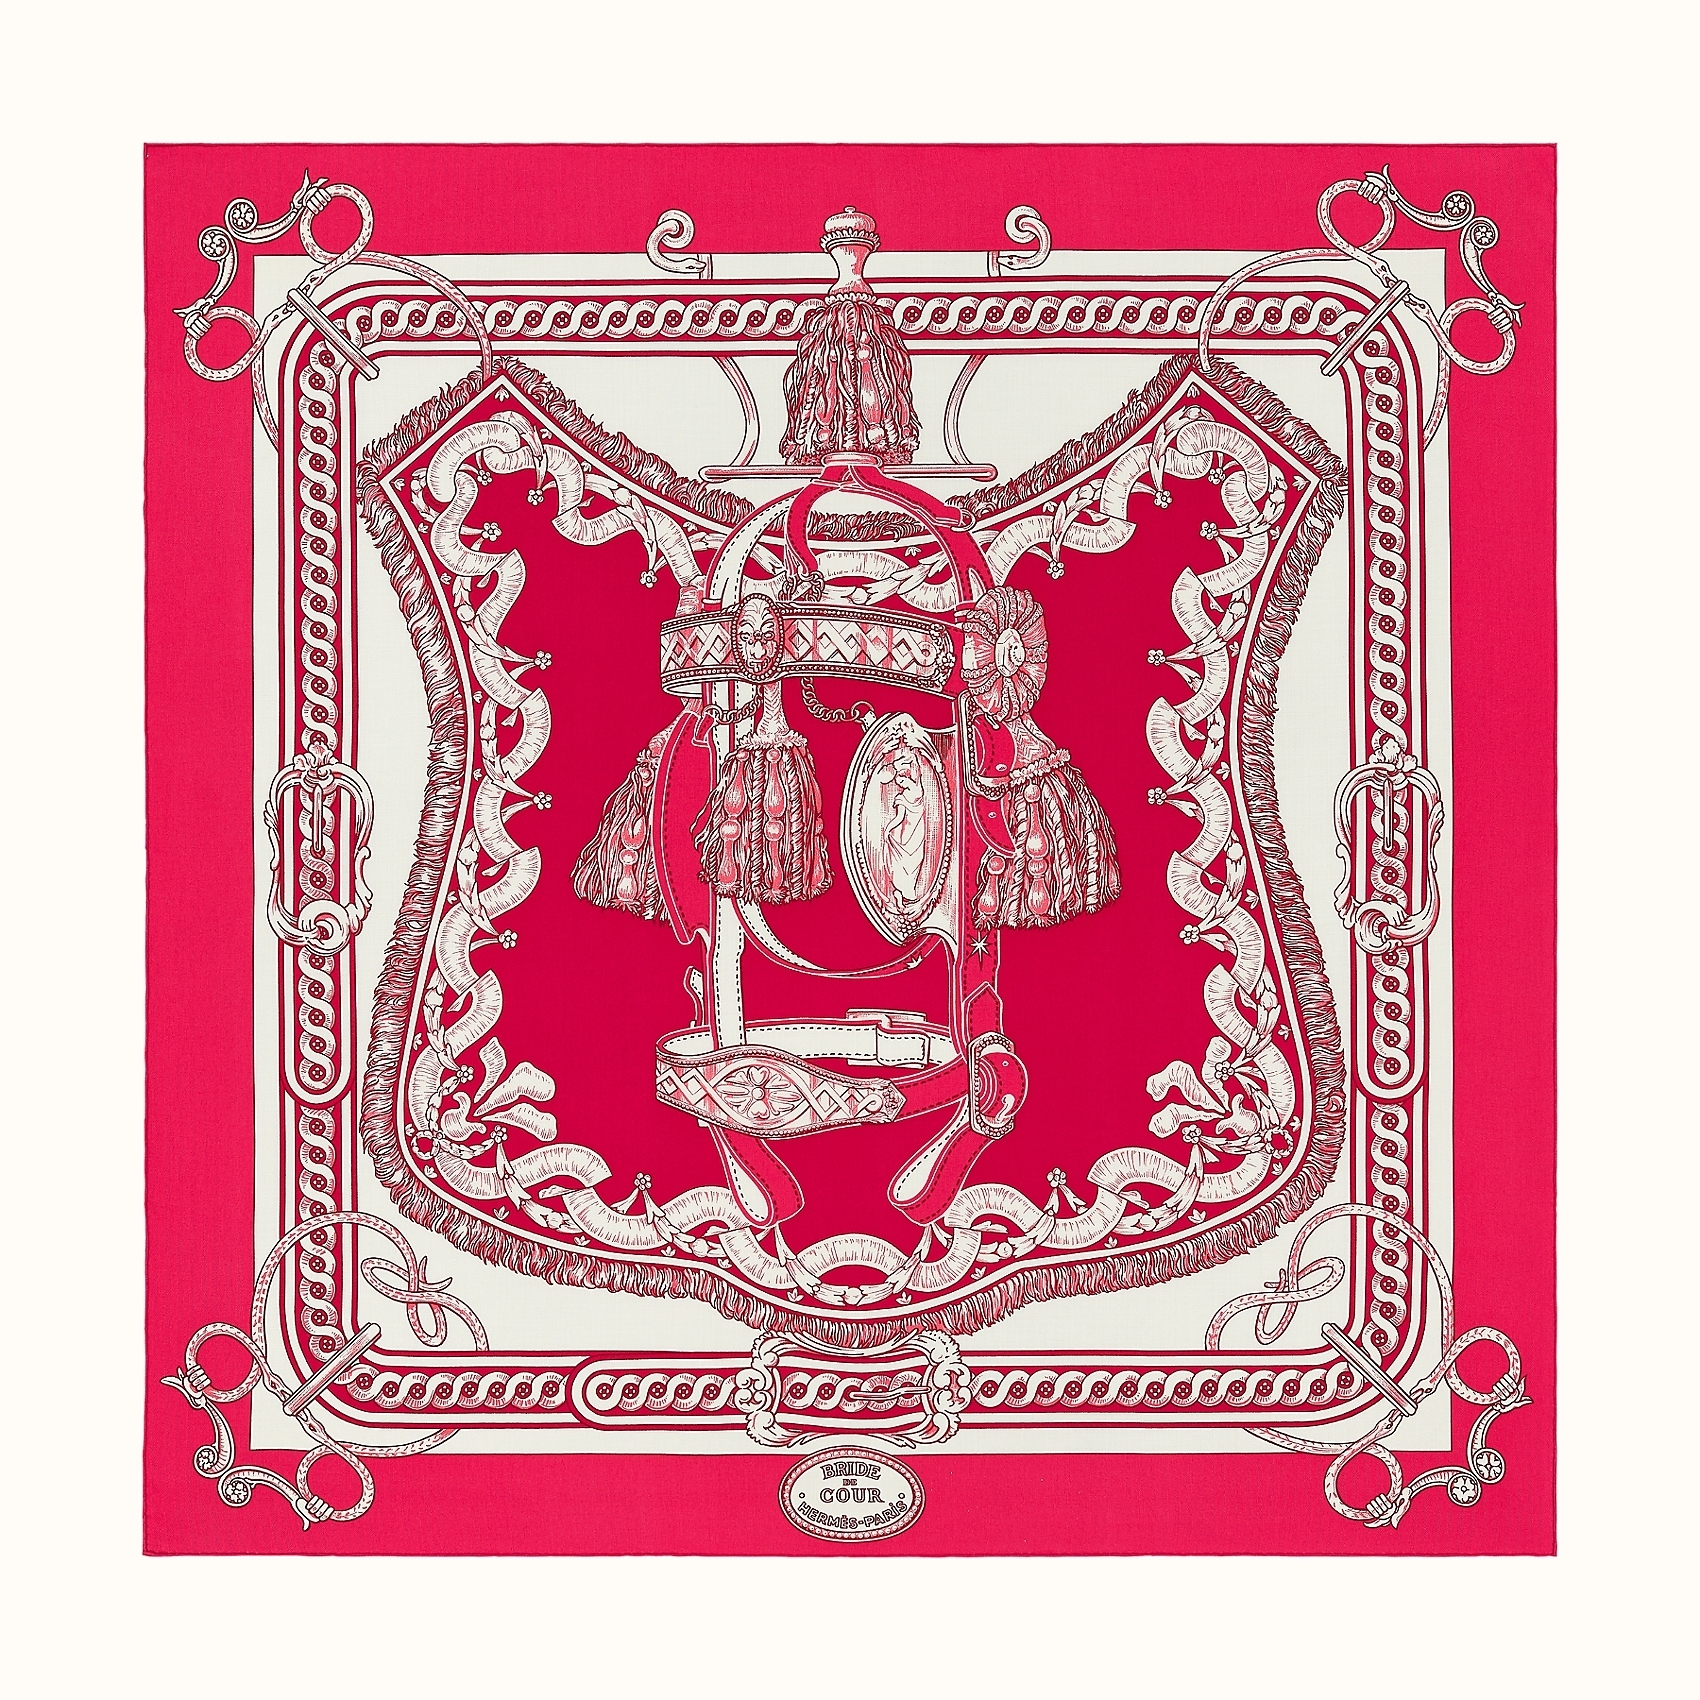 HERMES Bride de Cour Remix shawl 140 - Rose Vif/Fuchsia/Blanc